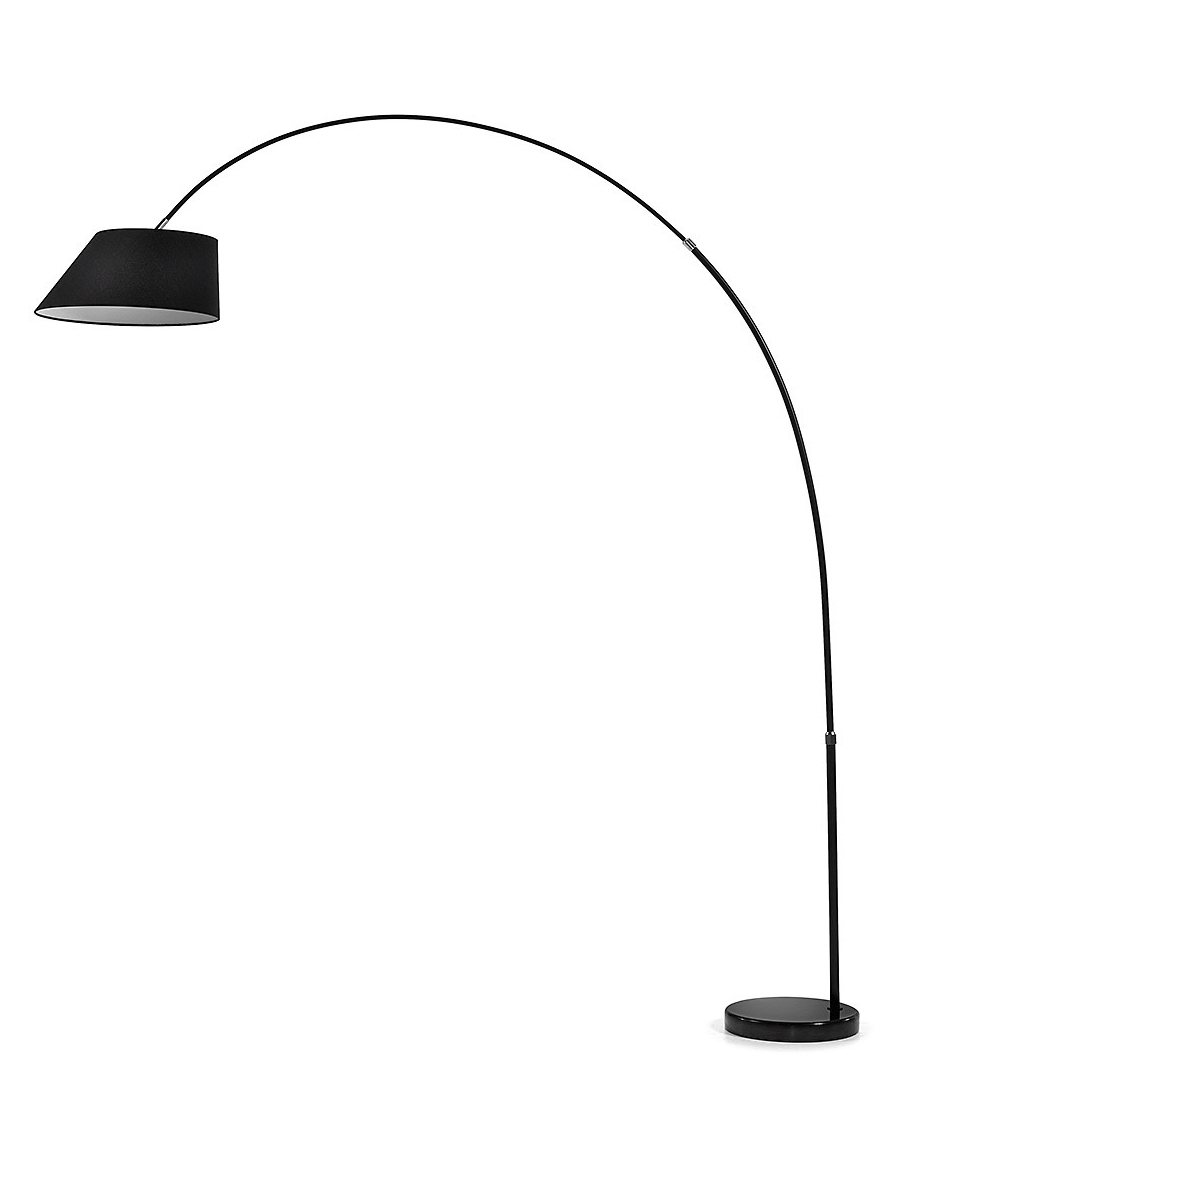 Kave Home Vloerlamp 'May', kleur zwart